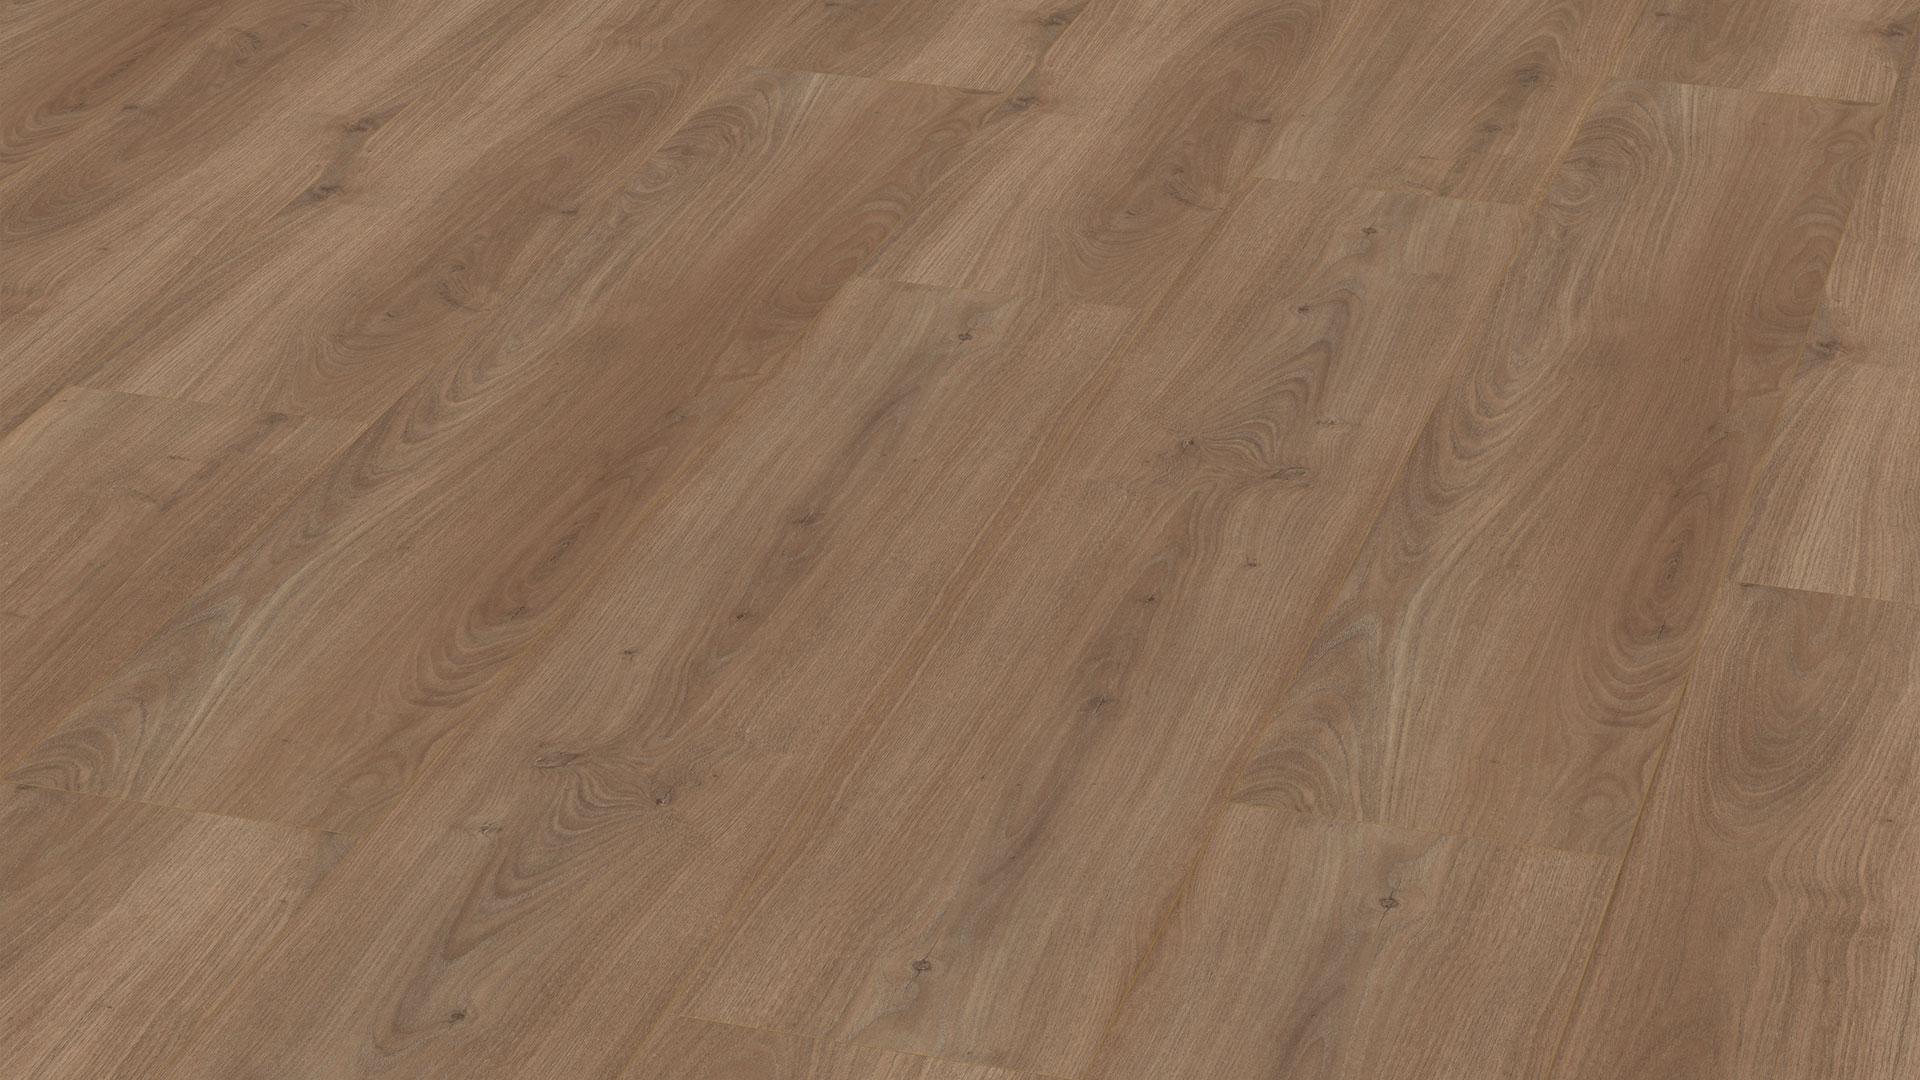 Fußbodenbelag Xl ~ Wood xl pl085c royal c.desert designböden sonnhaus purline der